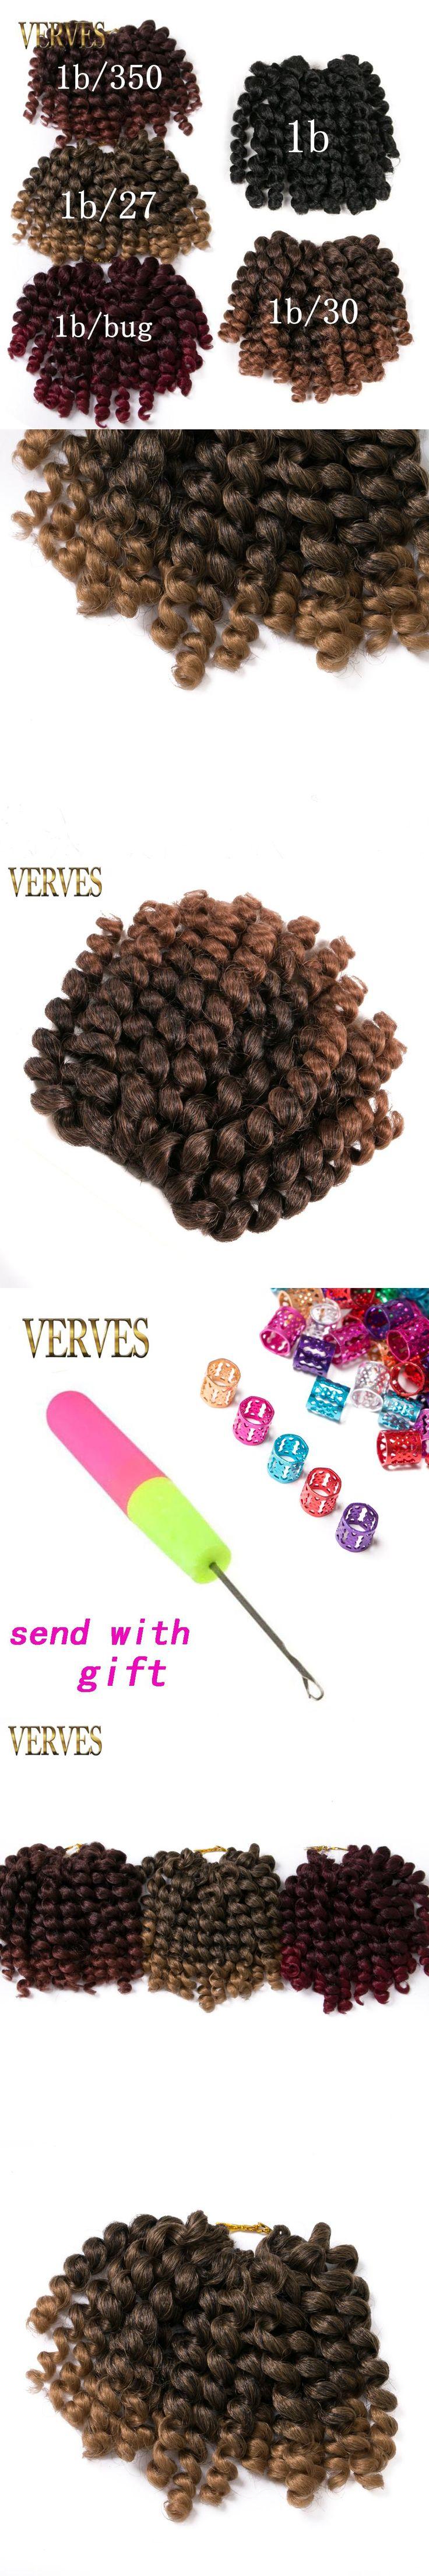 Crochet braids hair 1 piece 75g/pack 8 inch synthetic ombre braiding hair extentions VERVES  Havana Twist braids